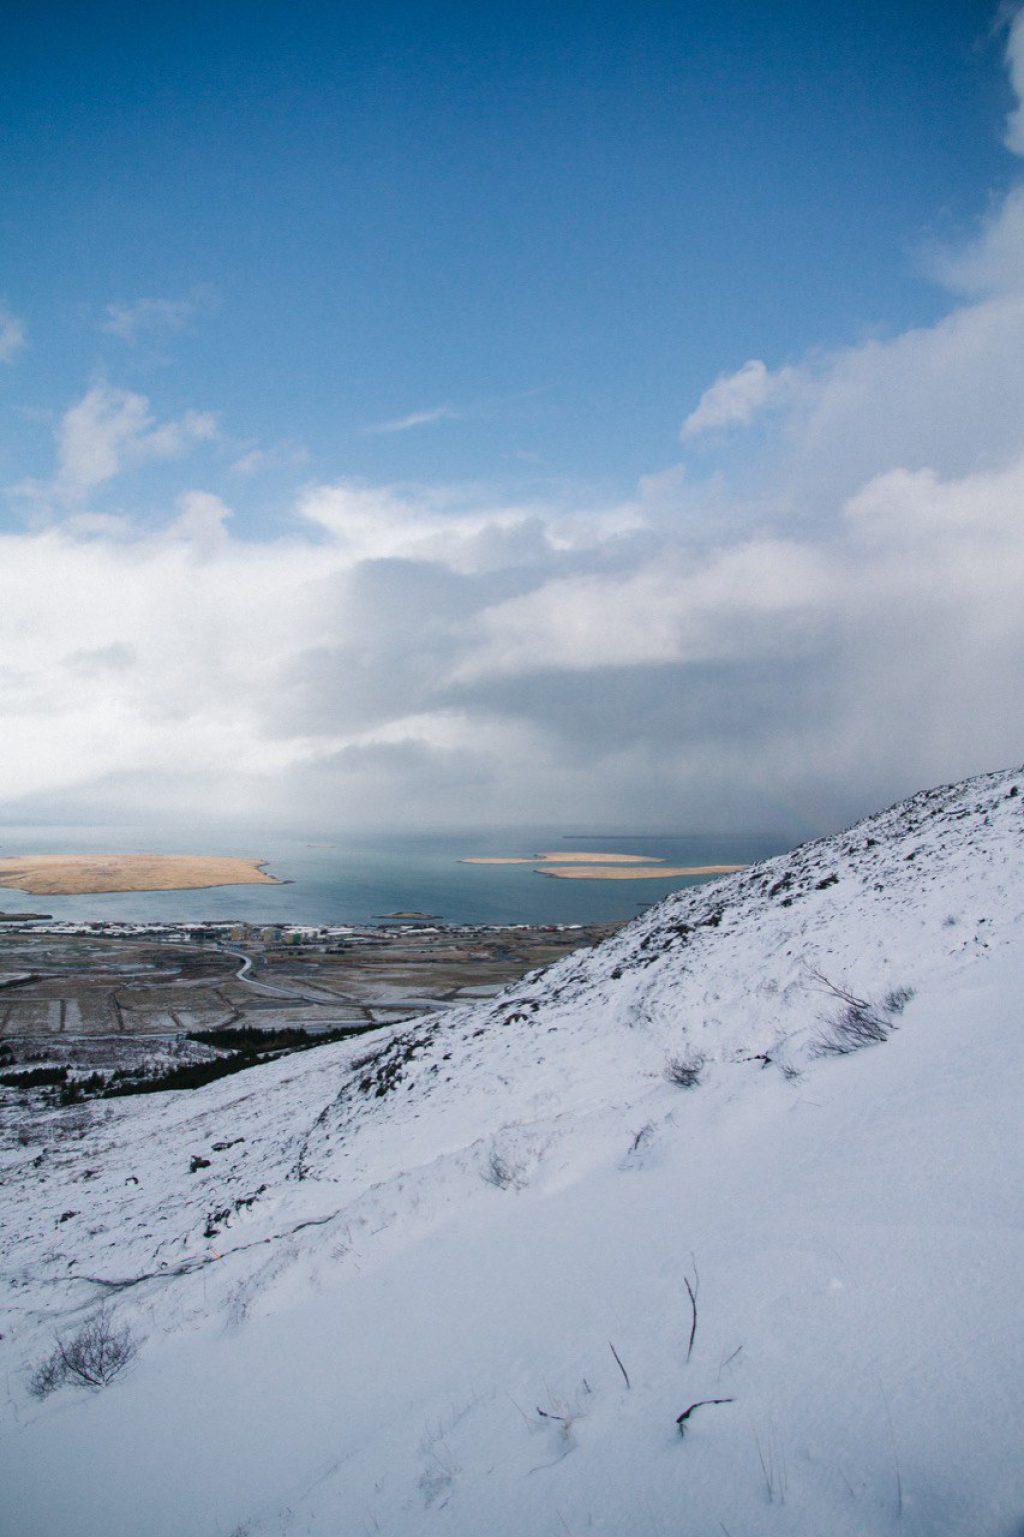 Iceland 2017 04 30 00 05 17